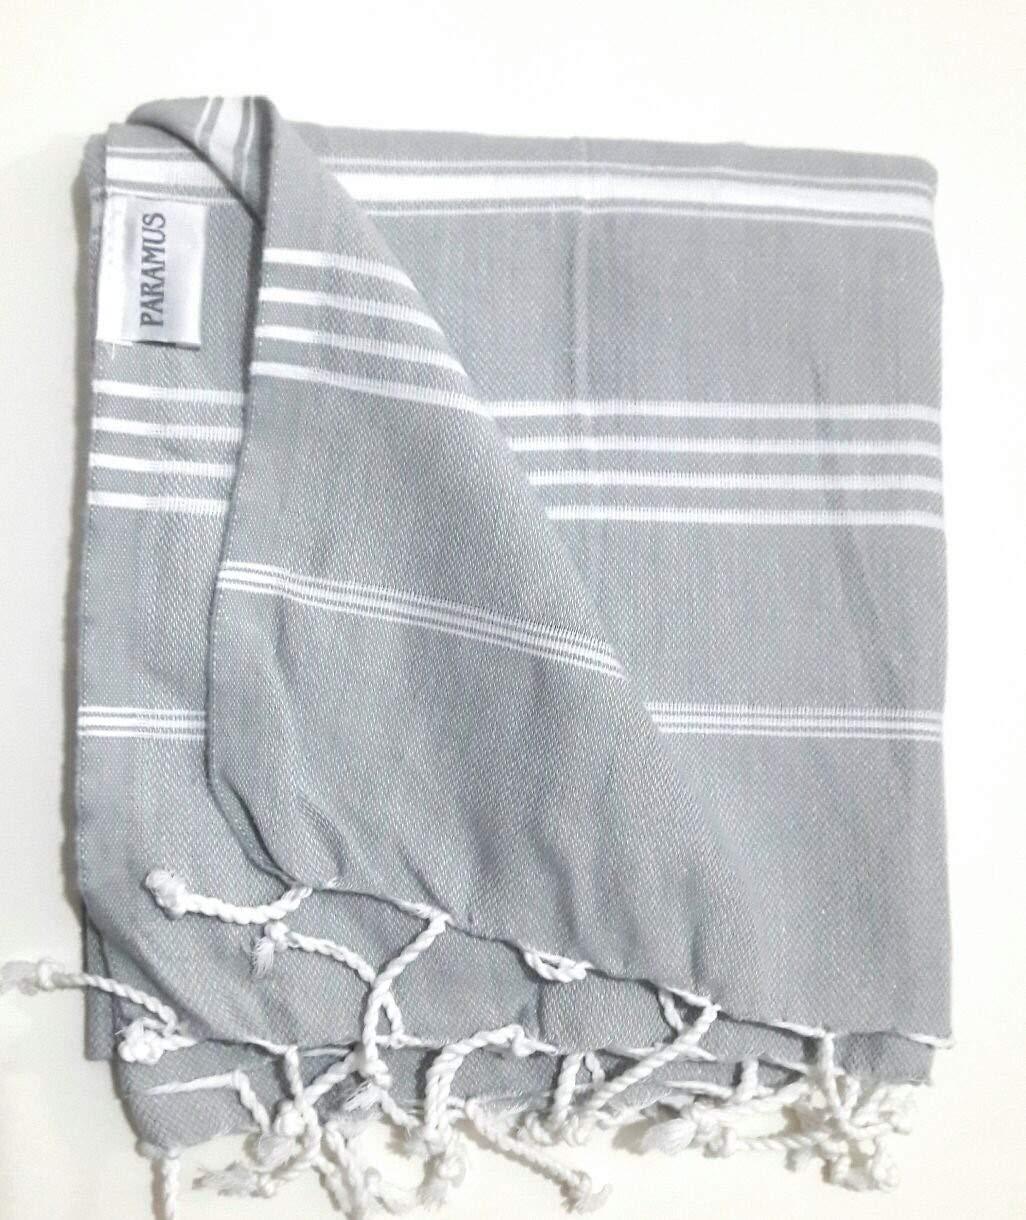 Paramus Turkish Towel Peshtemal in 100% Cotton for Beach Bath Swimming Pool Yoga Pilates Picnic Blanket Scarf Wrap Hammam Fouta Turkish Bath Towels Beach Towel (37x 70) (Blue, hierapolis)